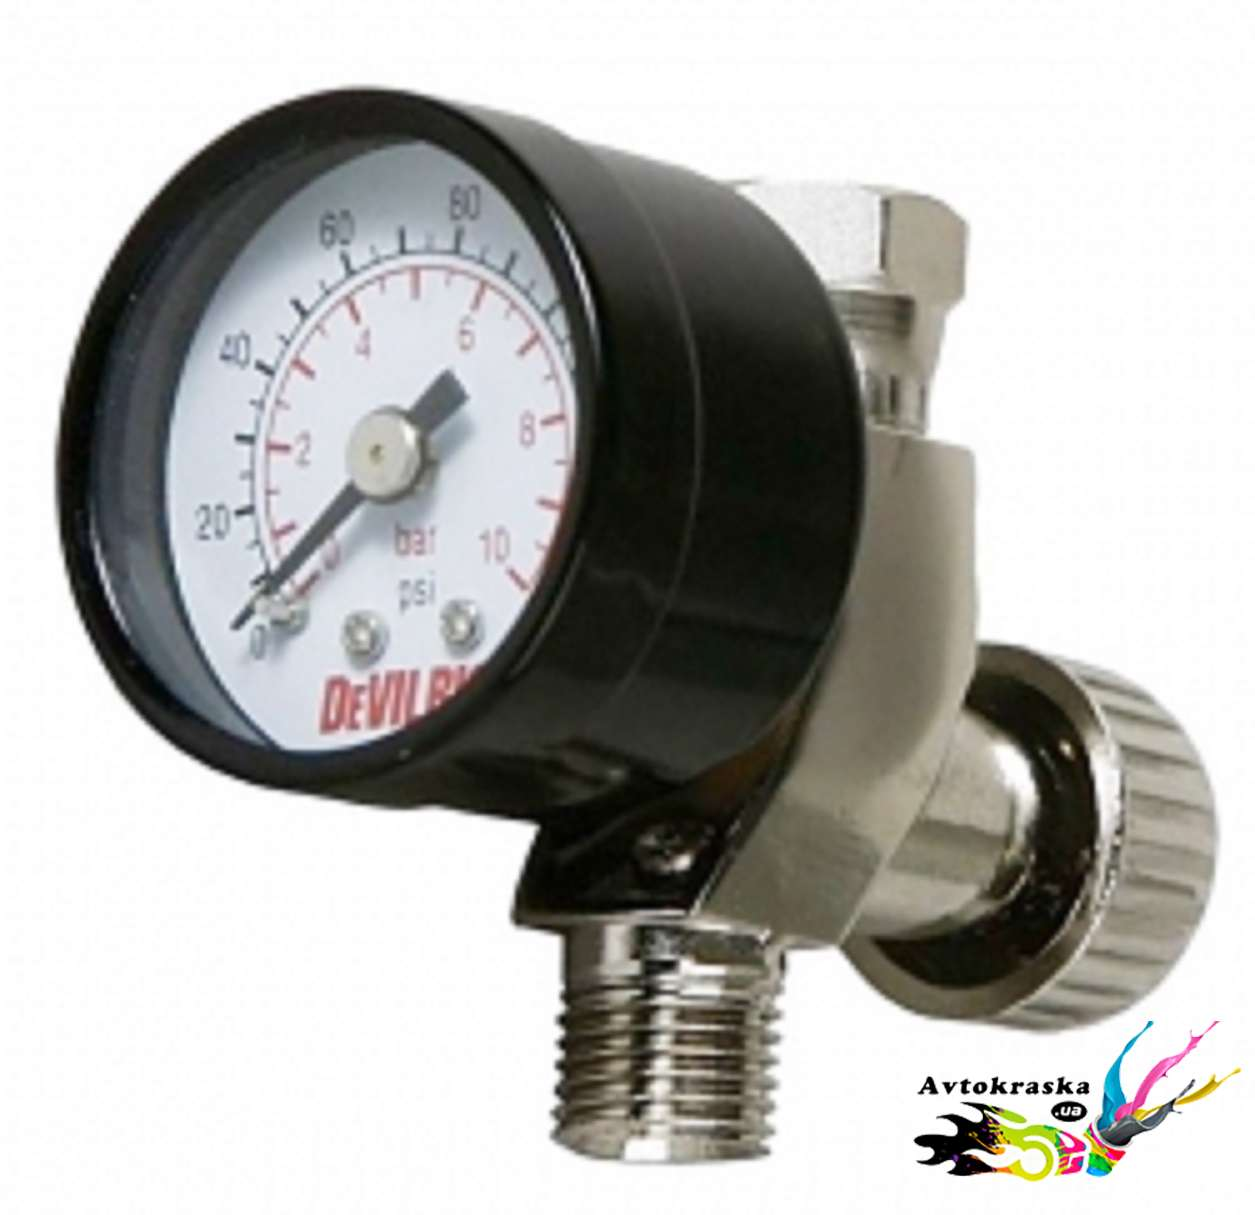 Манометр Devilbiss с регулятор давления воздуха HAV-501-B - HAV-501-B